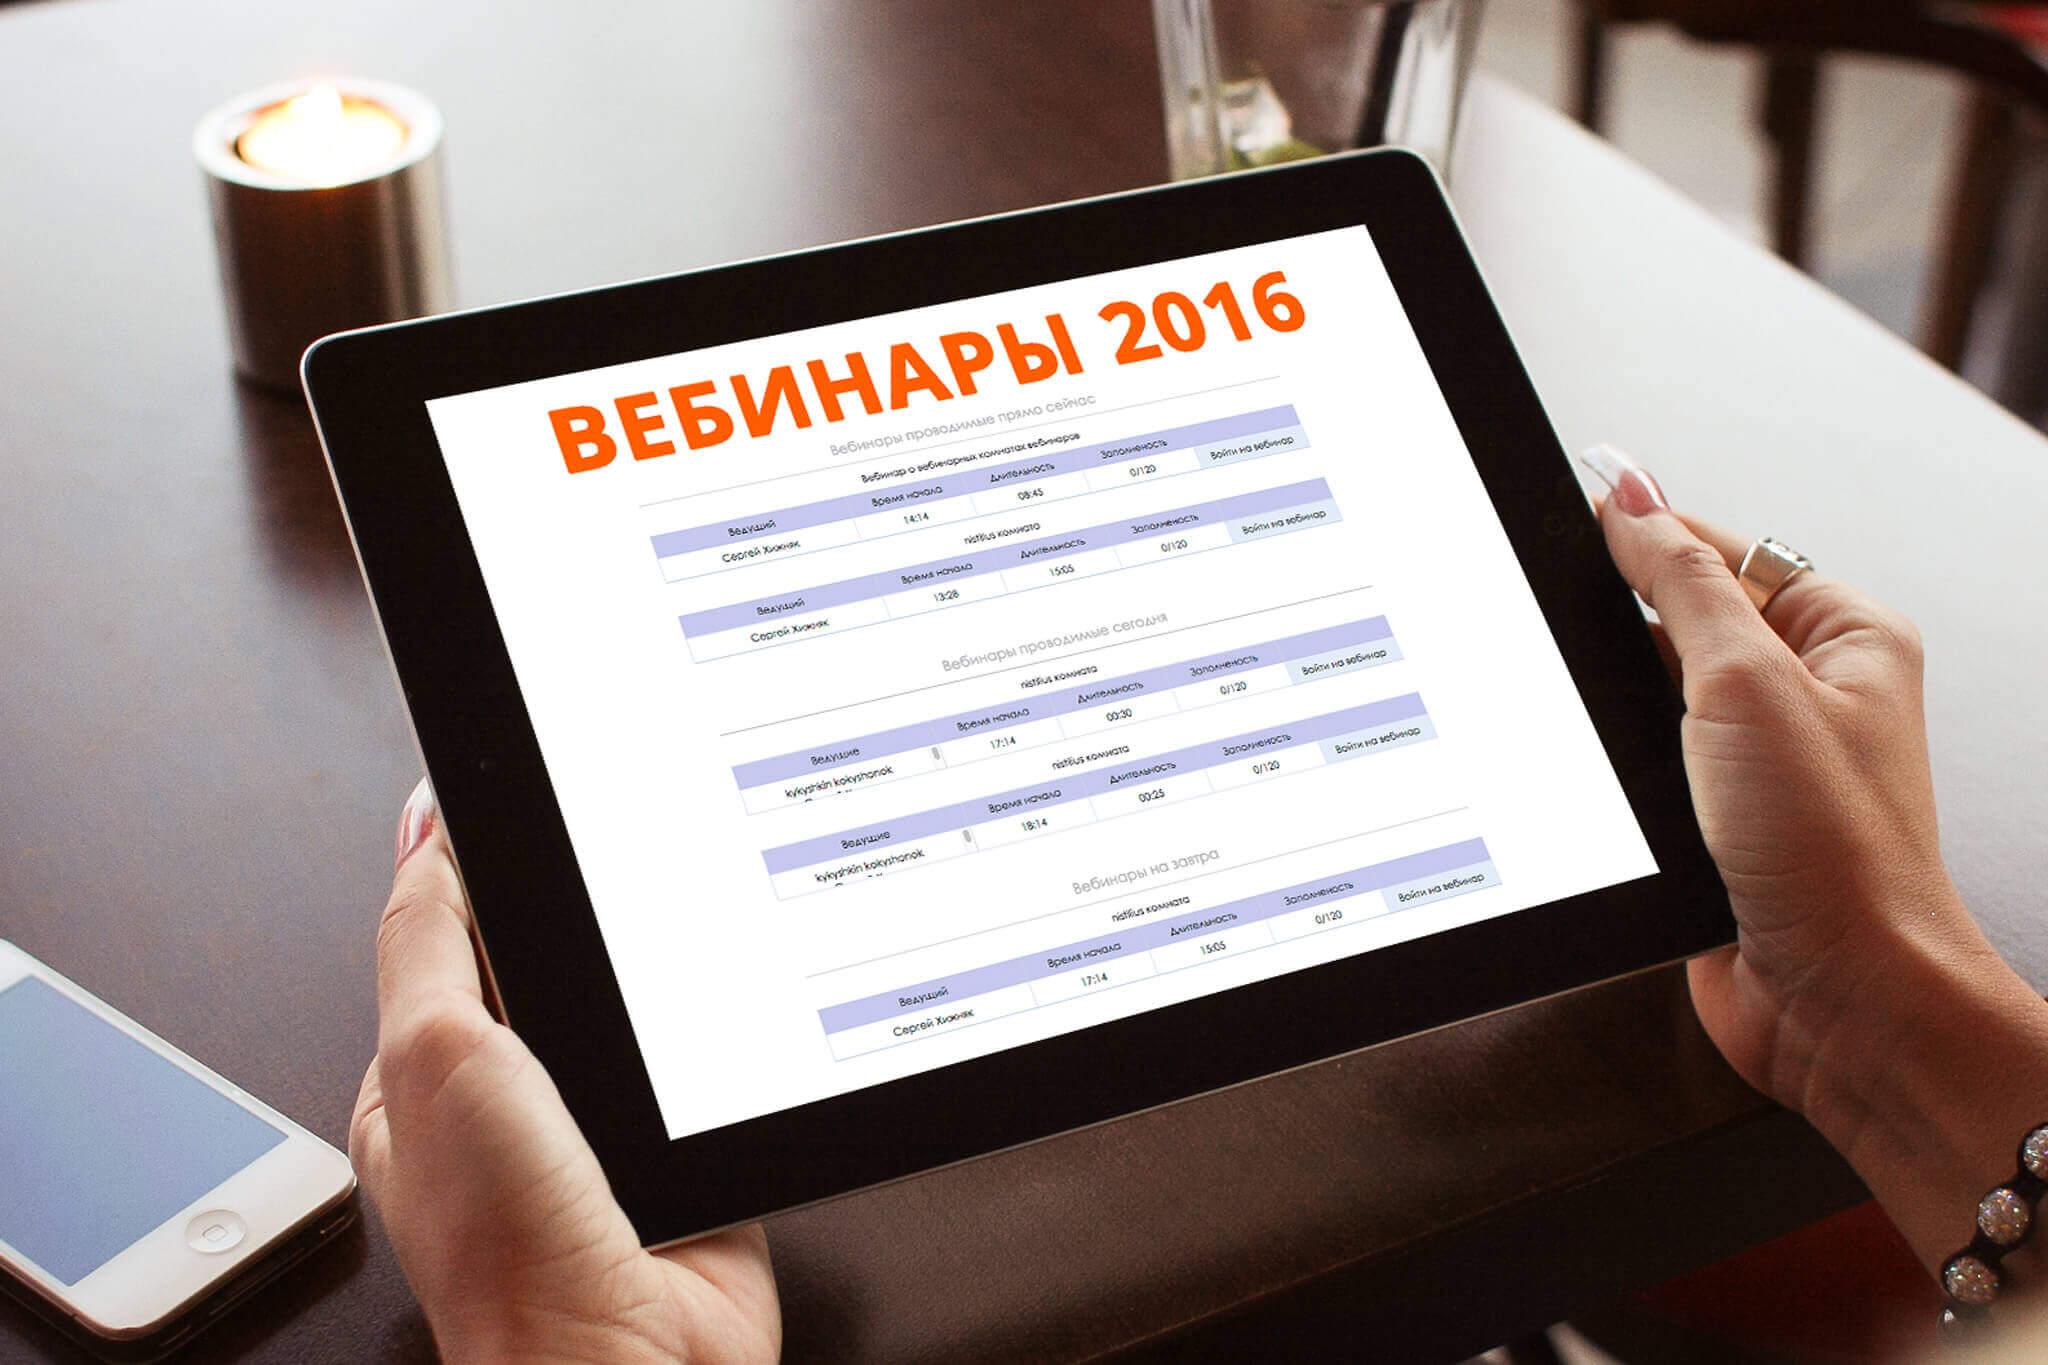 вебинары 2016